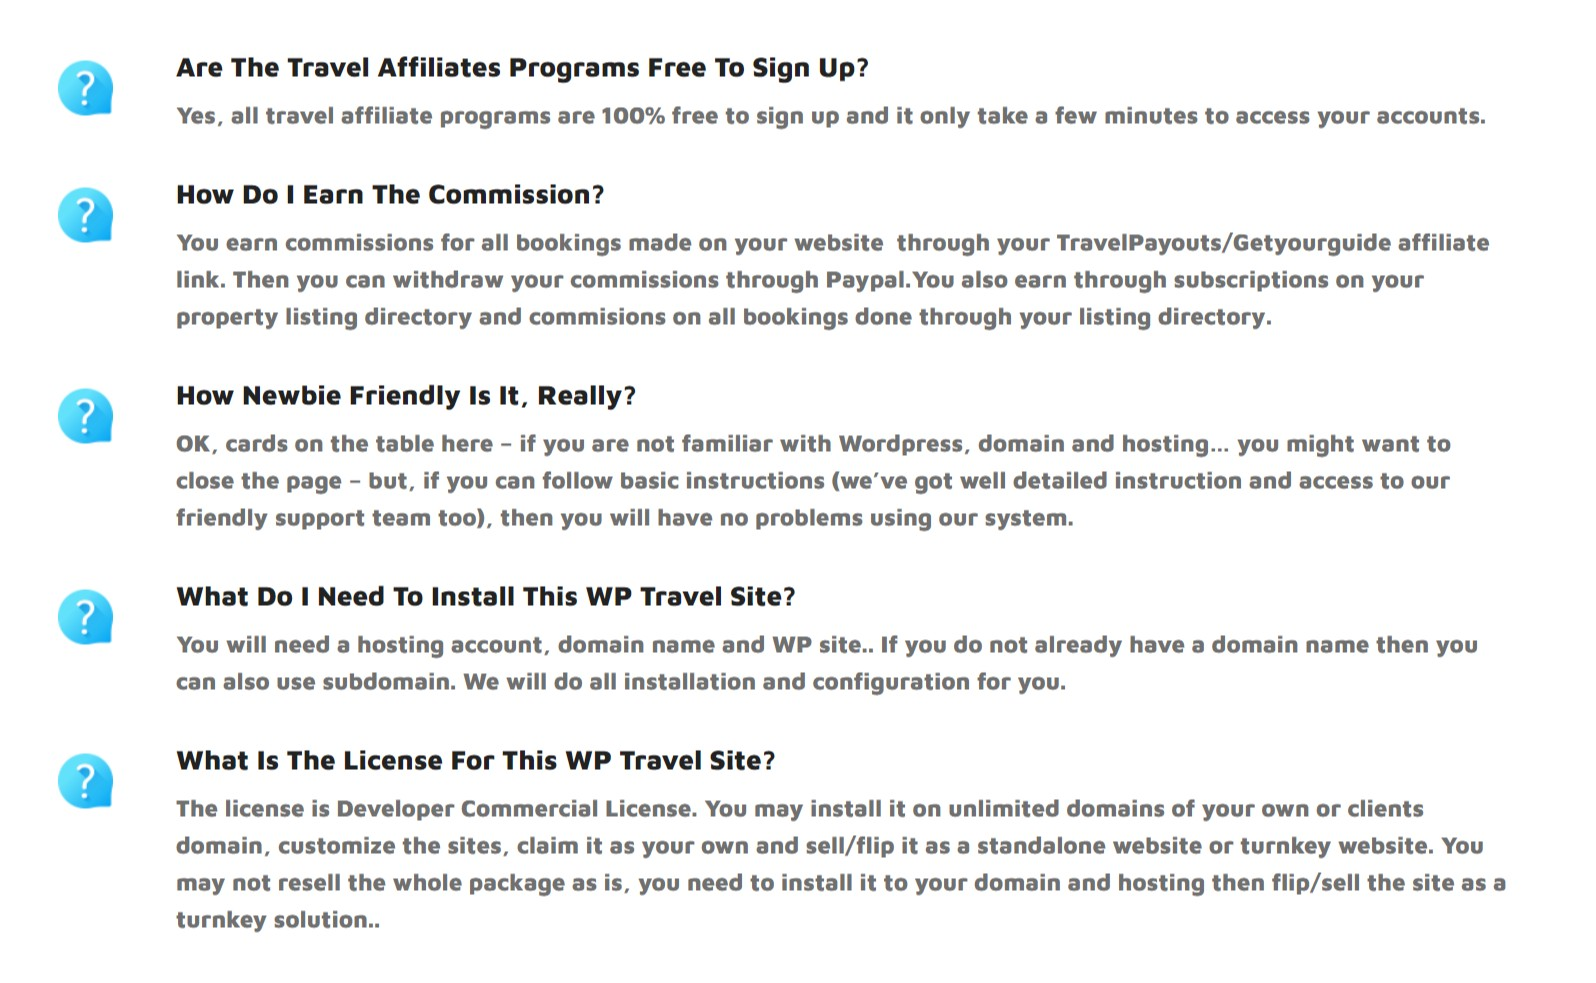 WP-Automated-Travel-Website-1-faq